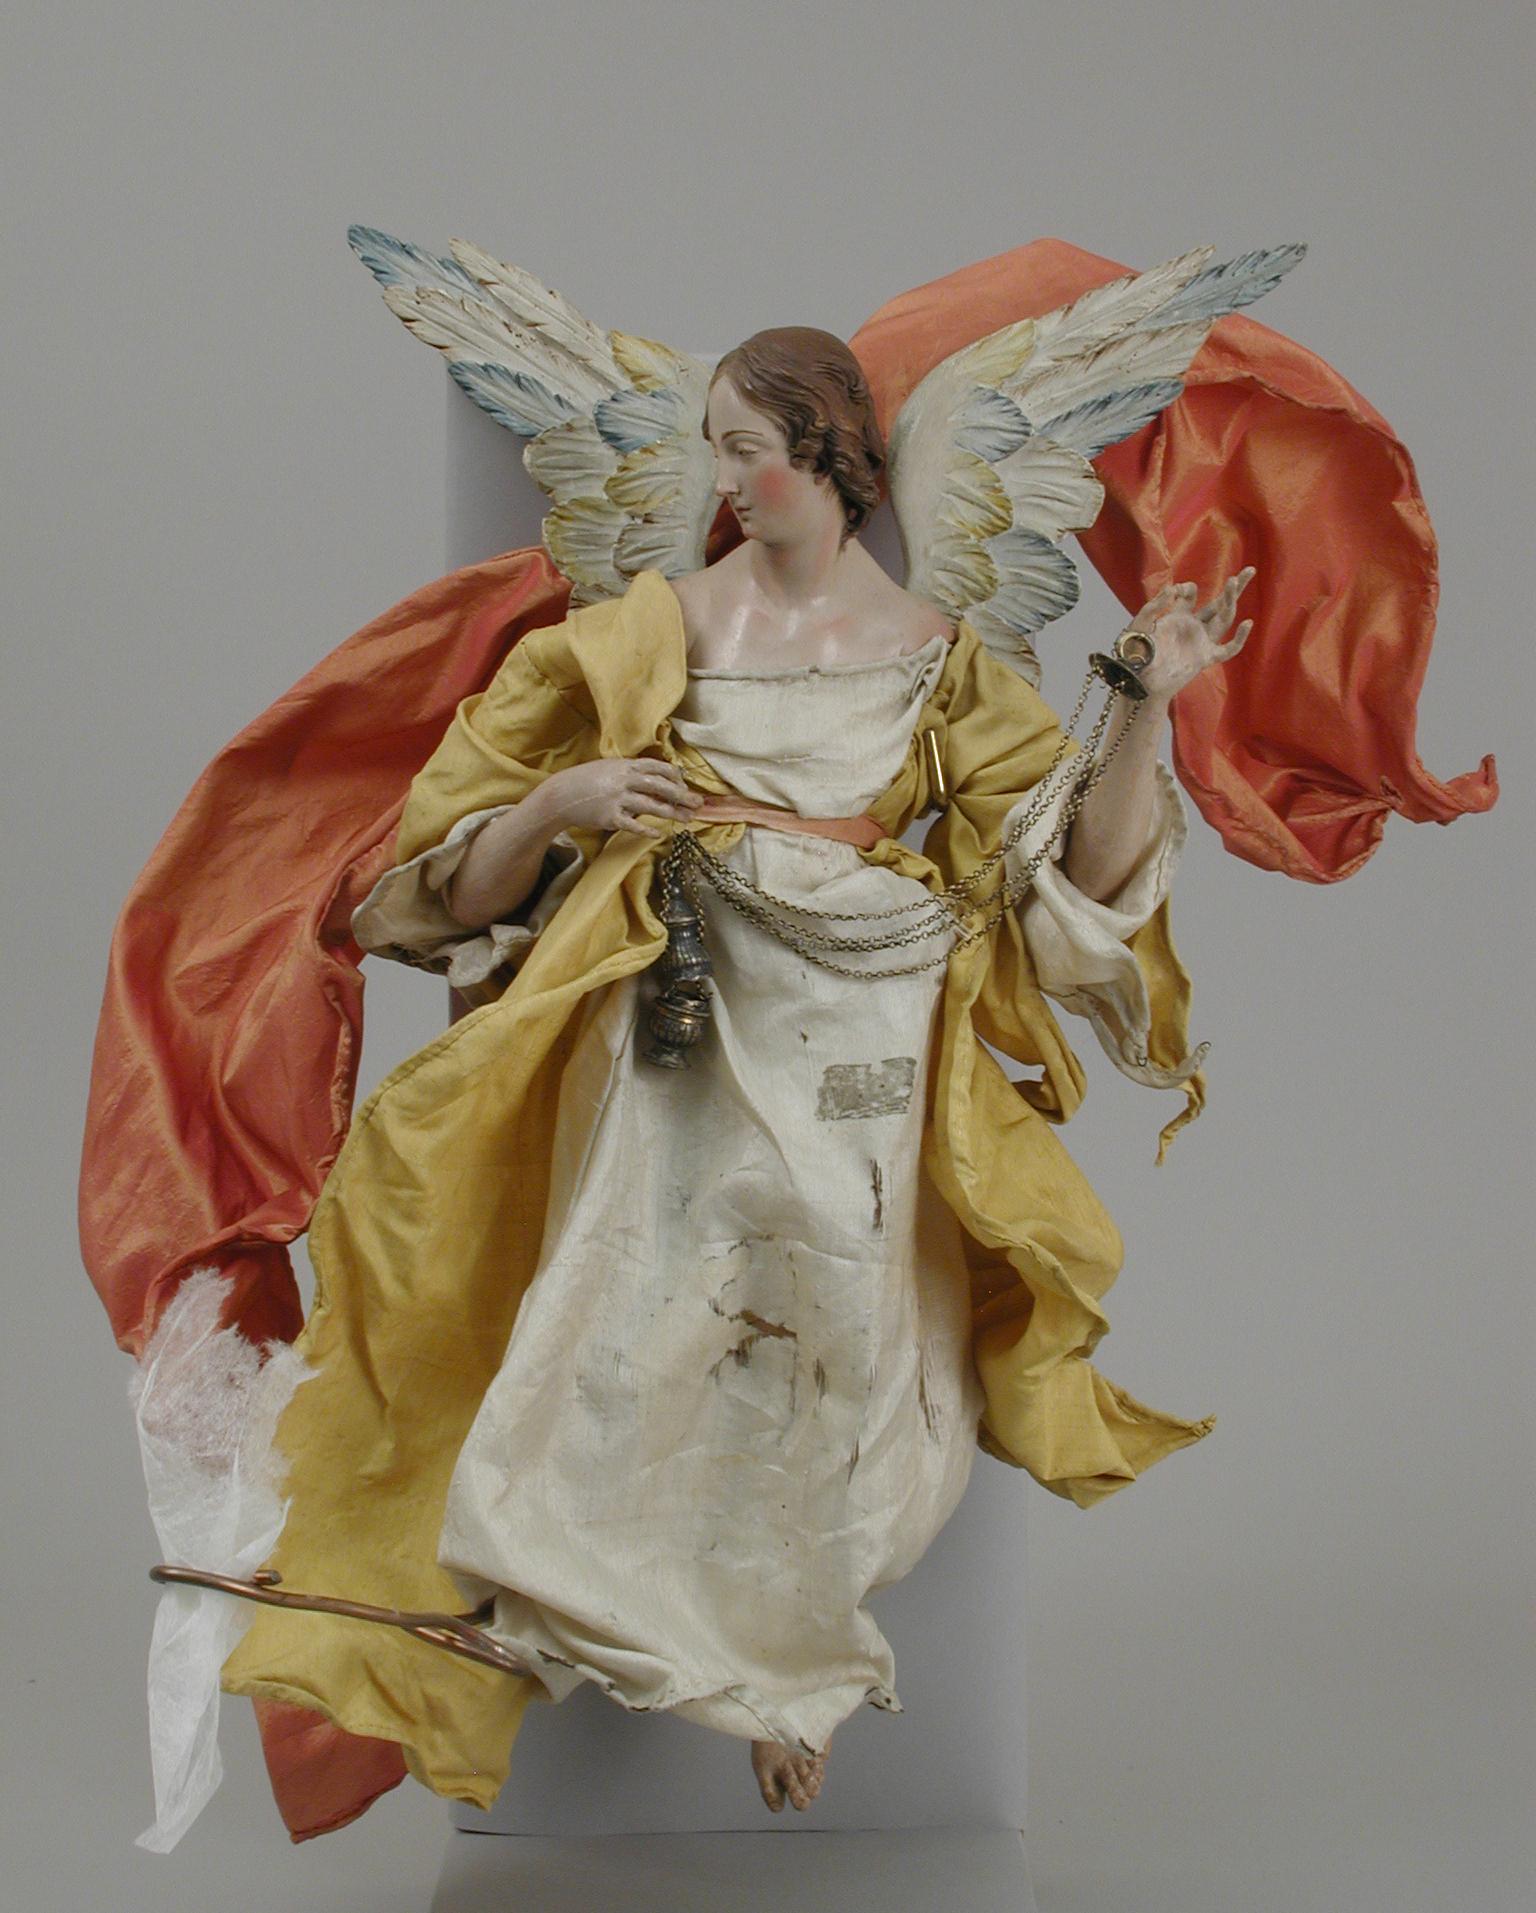 https://images.metmuseum.org/CRDImages/es/original/LC-64_164_20.jpg